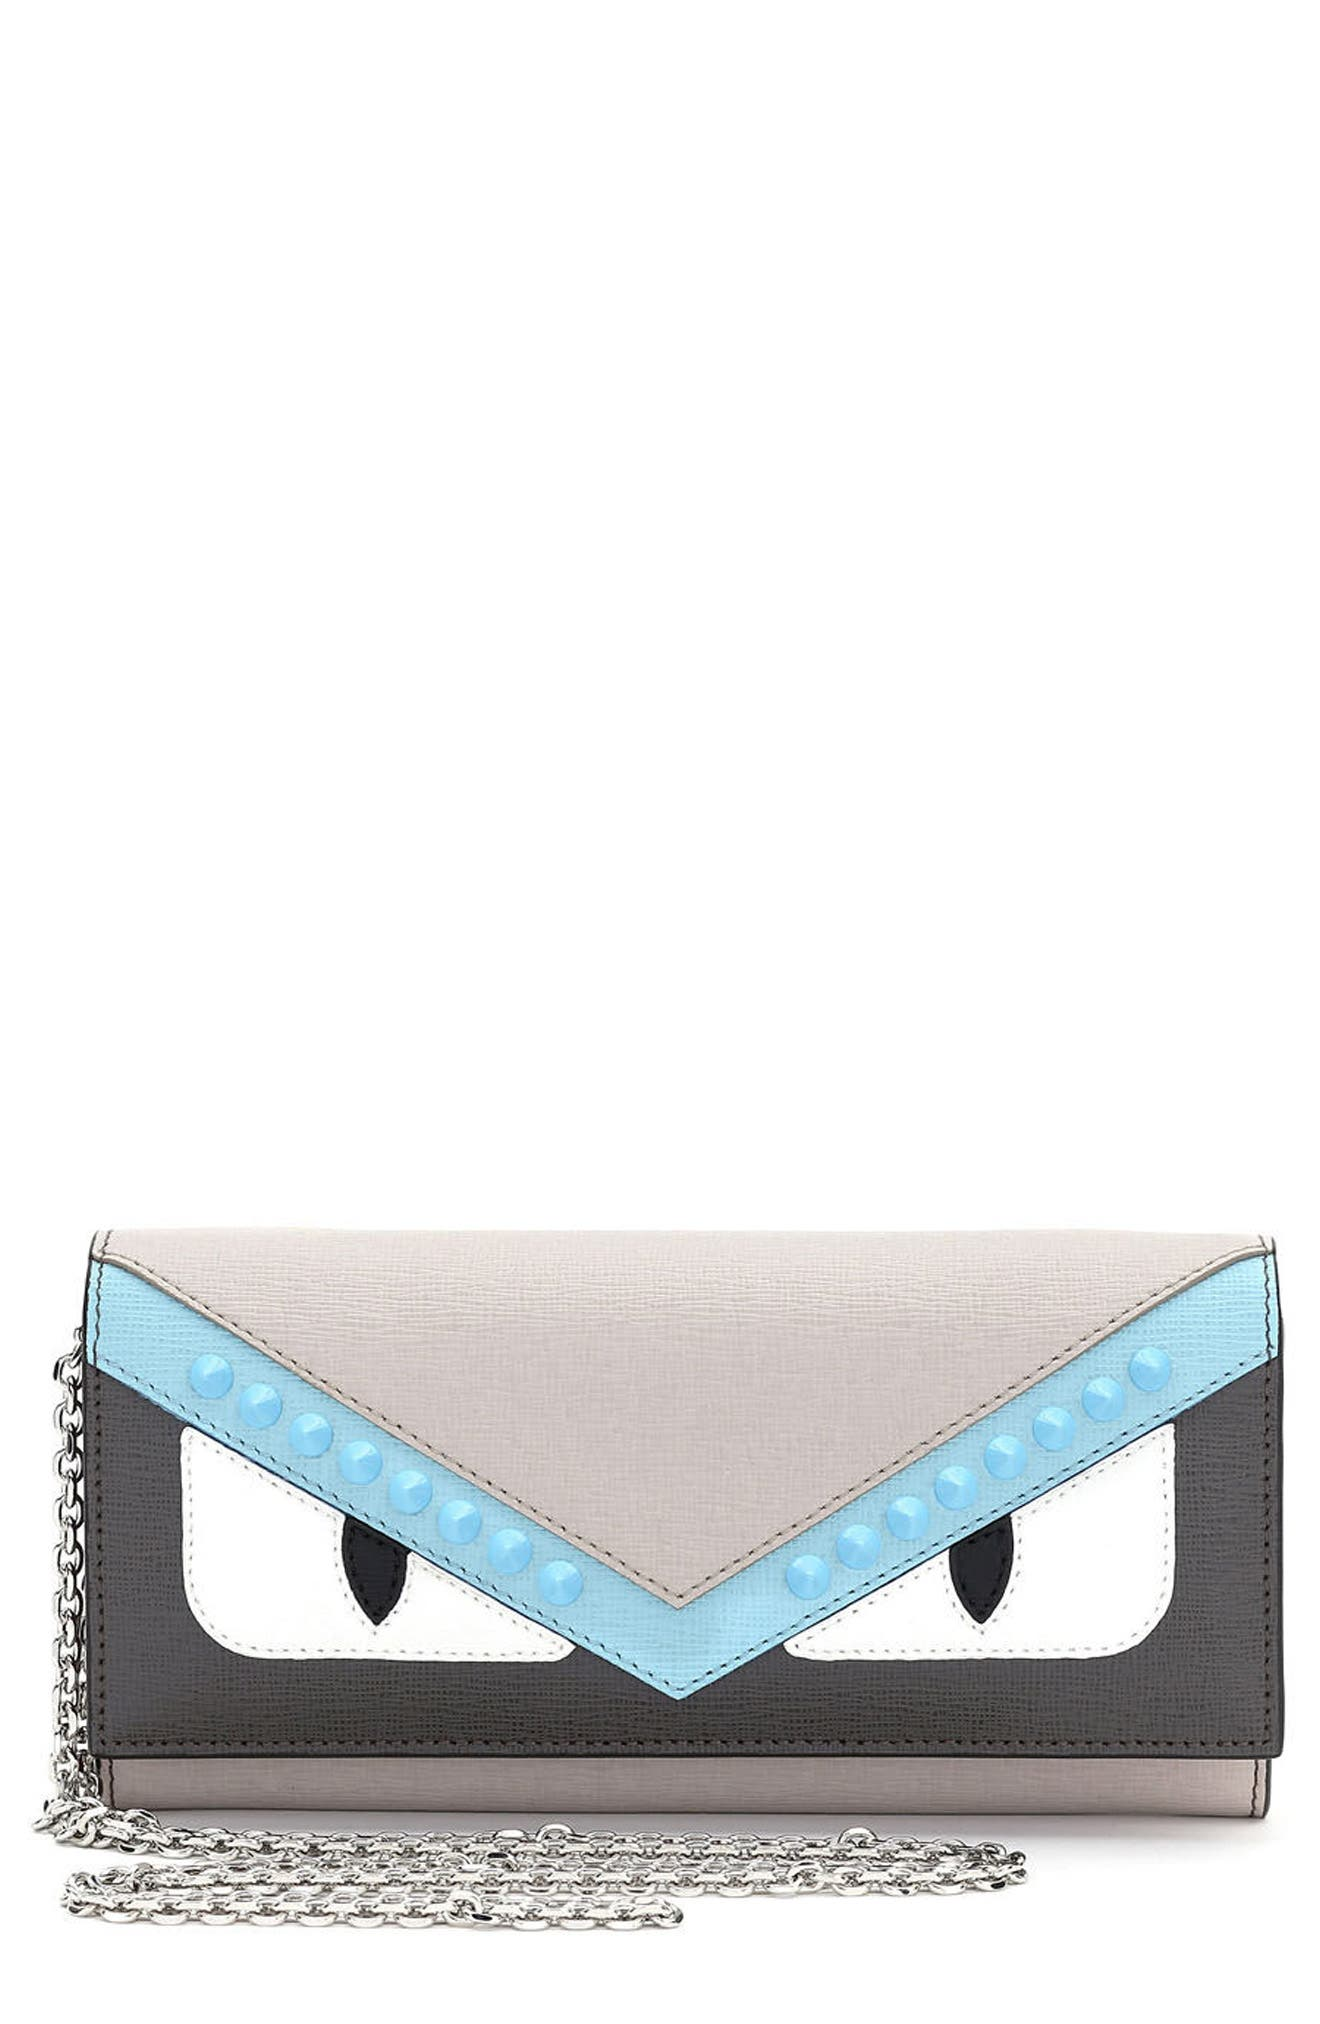 Fendi Monster Elite Leather Continental Wallet